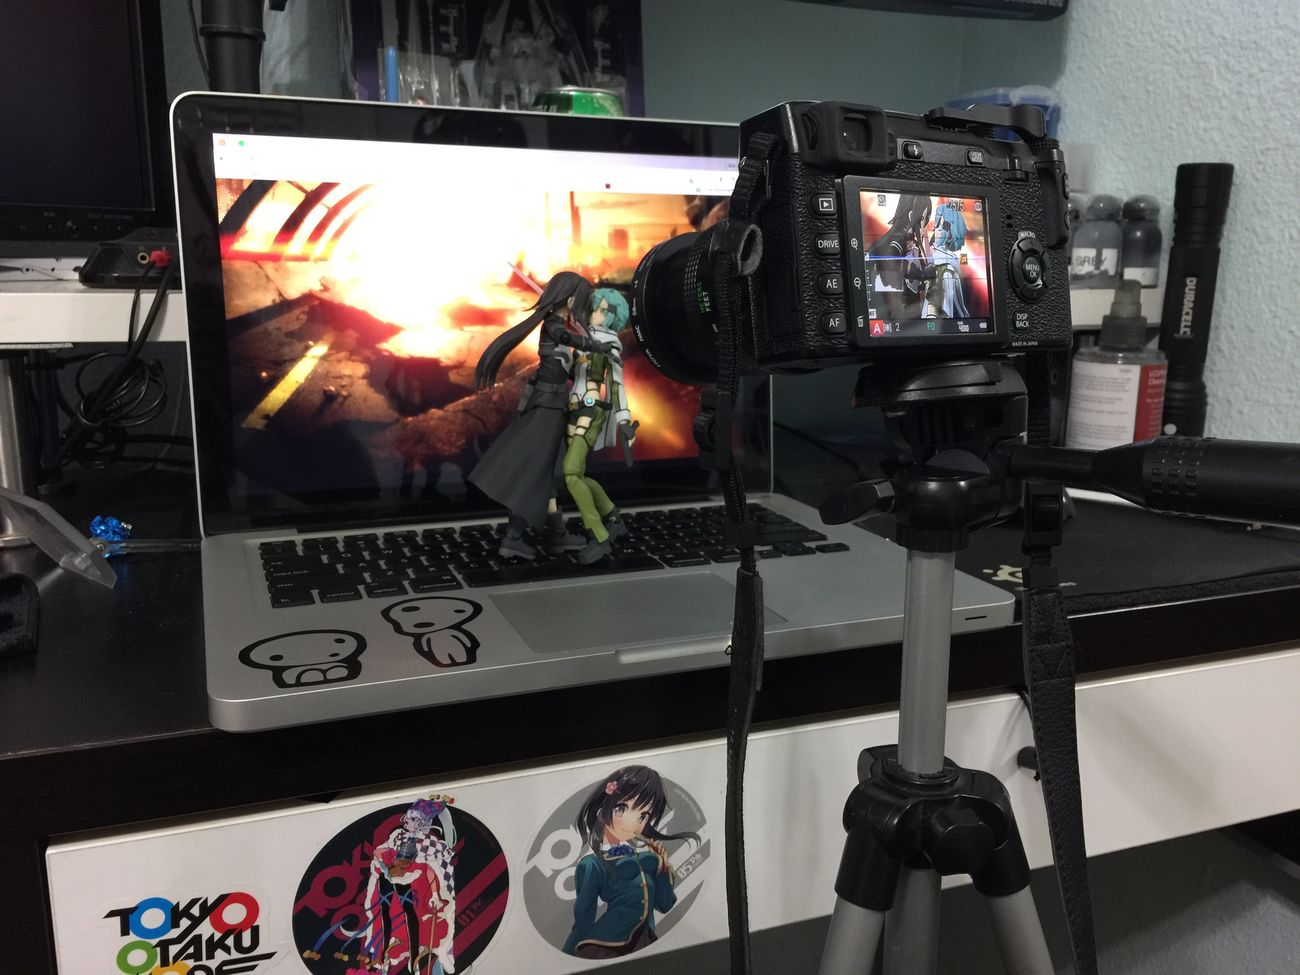 Behind the scenes of my previous photo. Kirito Sinon Ggo Sao SwordArtOnline Figma Good Smile Company Max Factory Fujifilm Xe1 Mbp